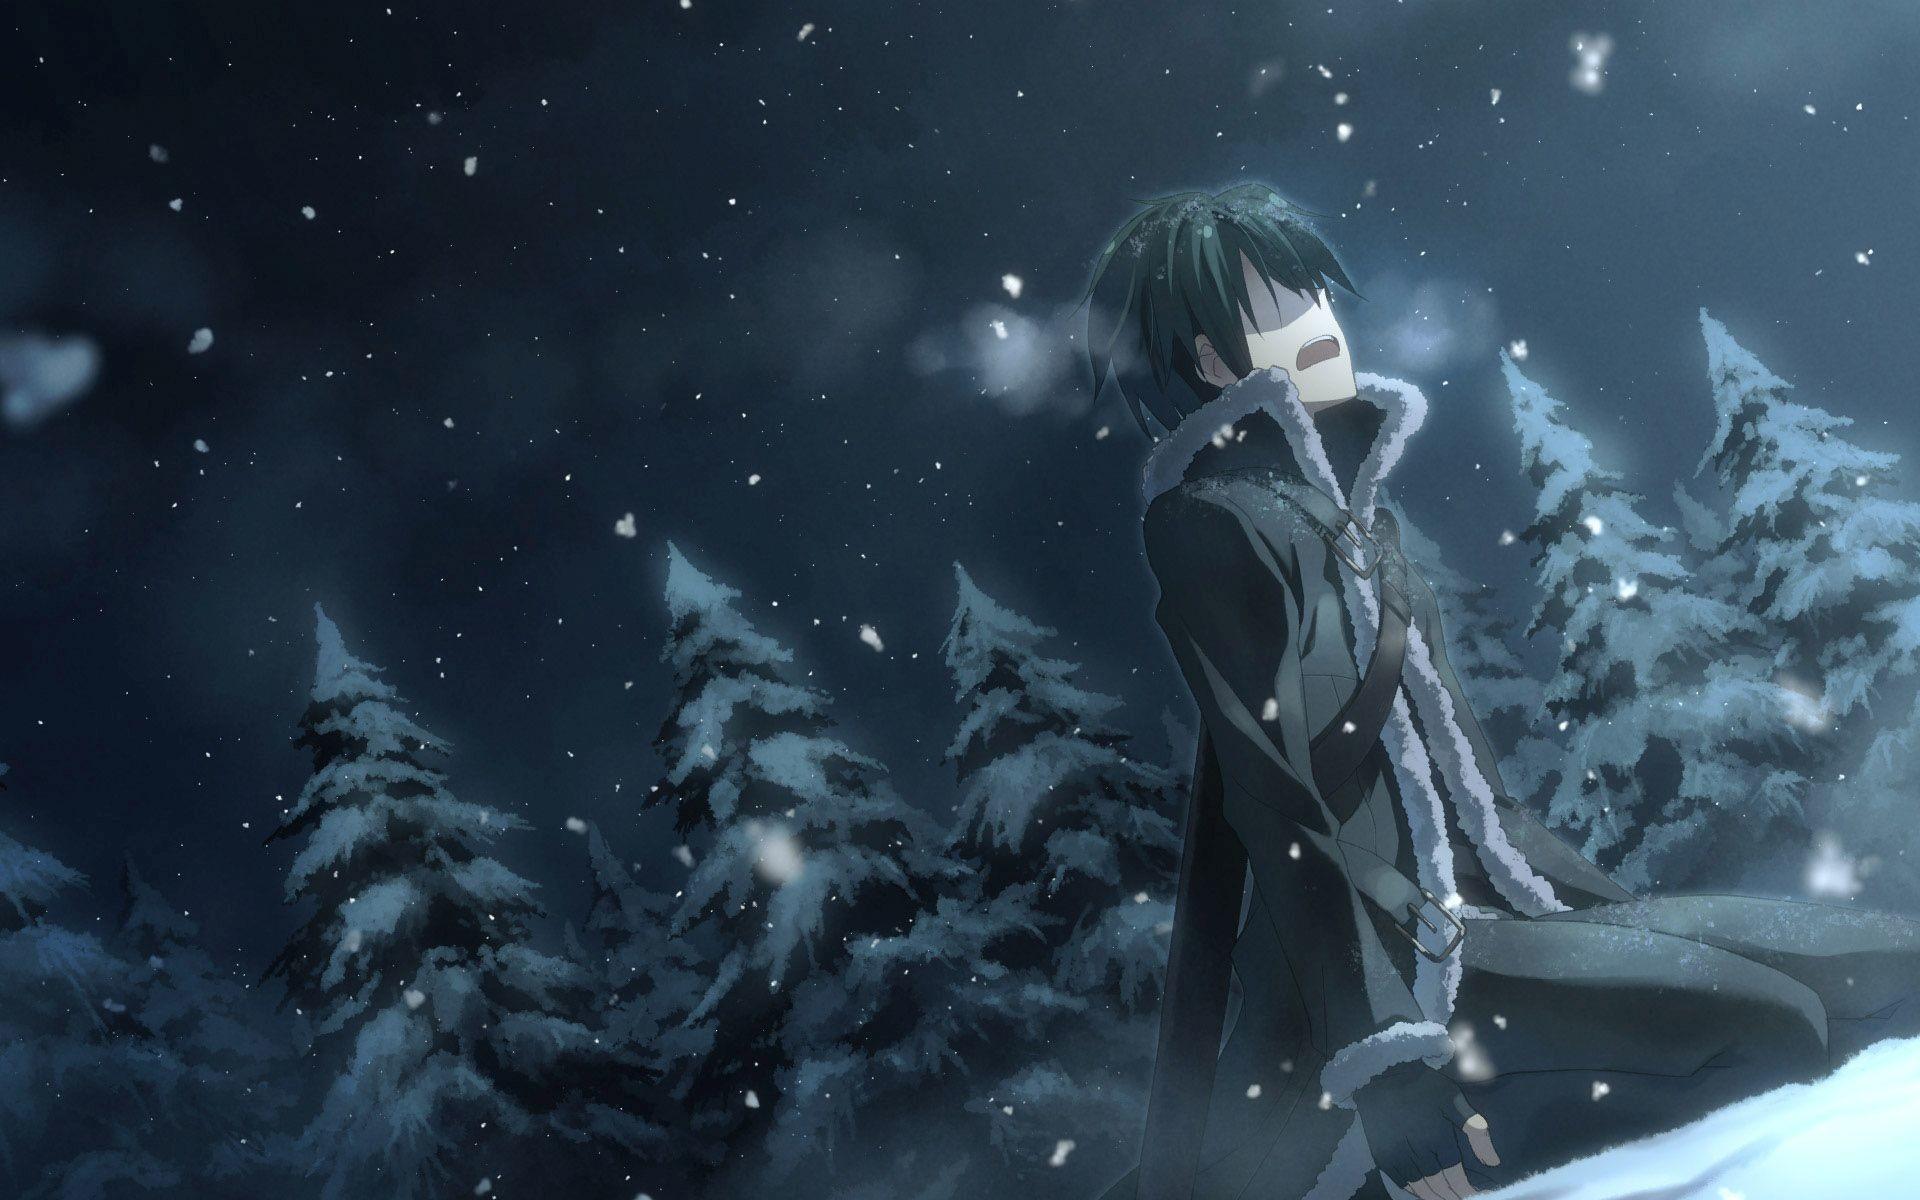 … Kirito – Sword Art Online HD Wallpaper 1920×1200